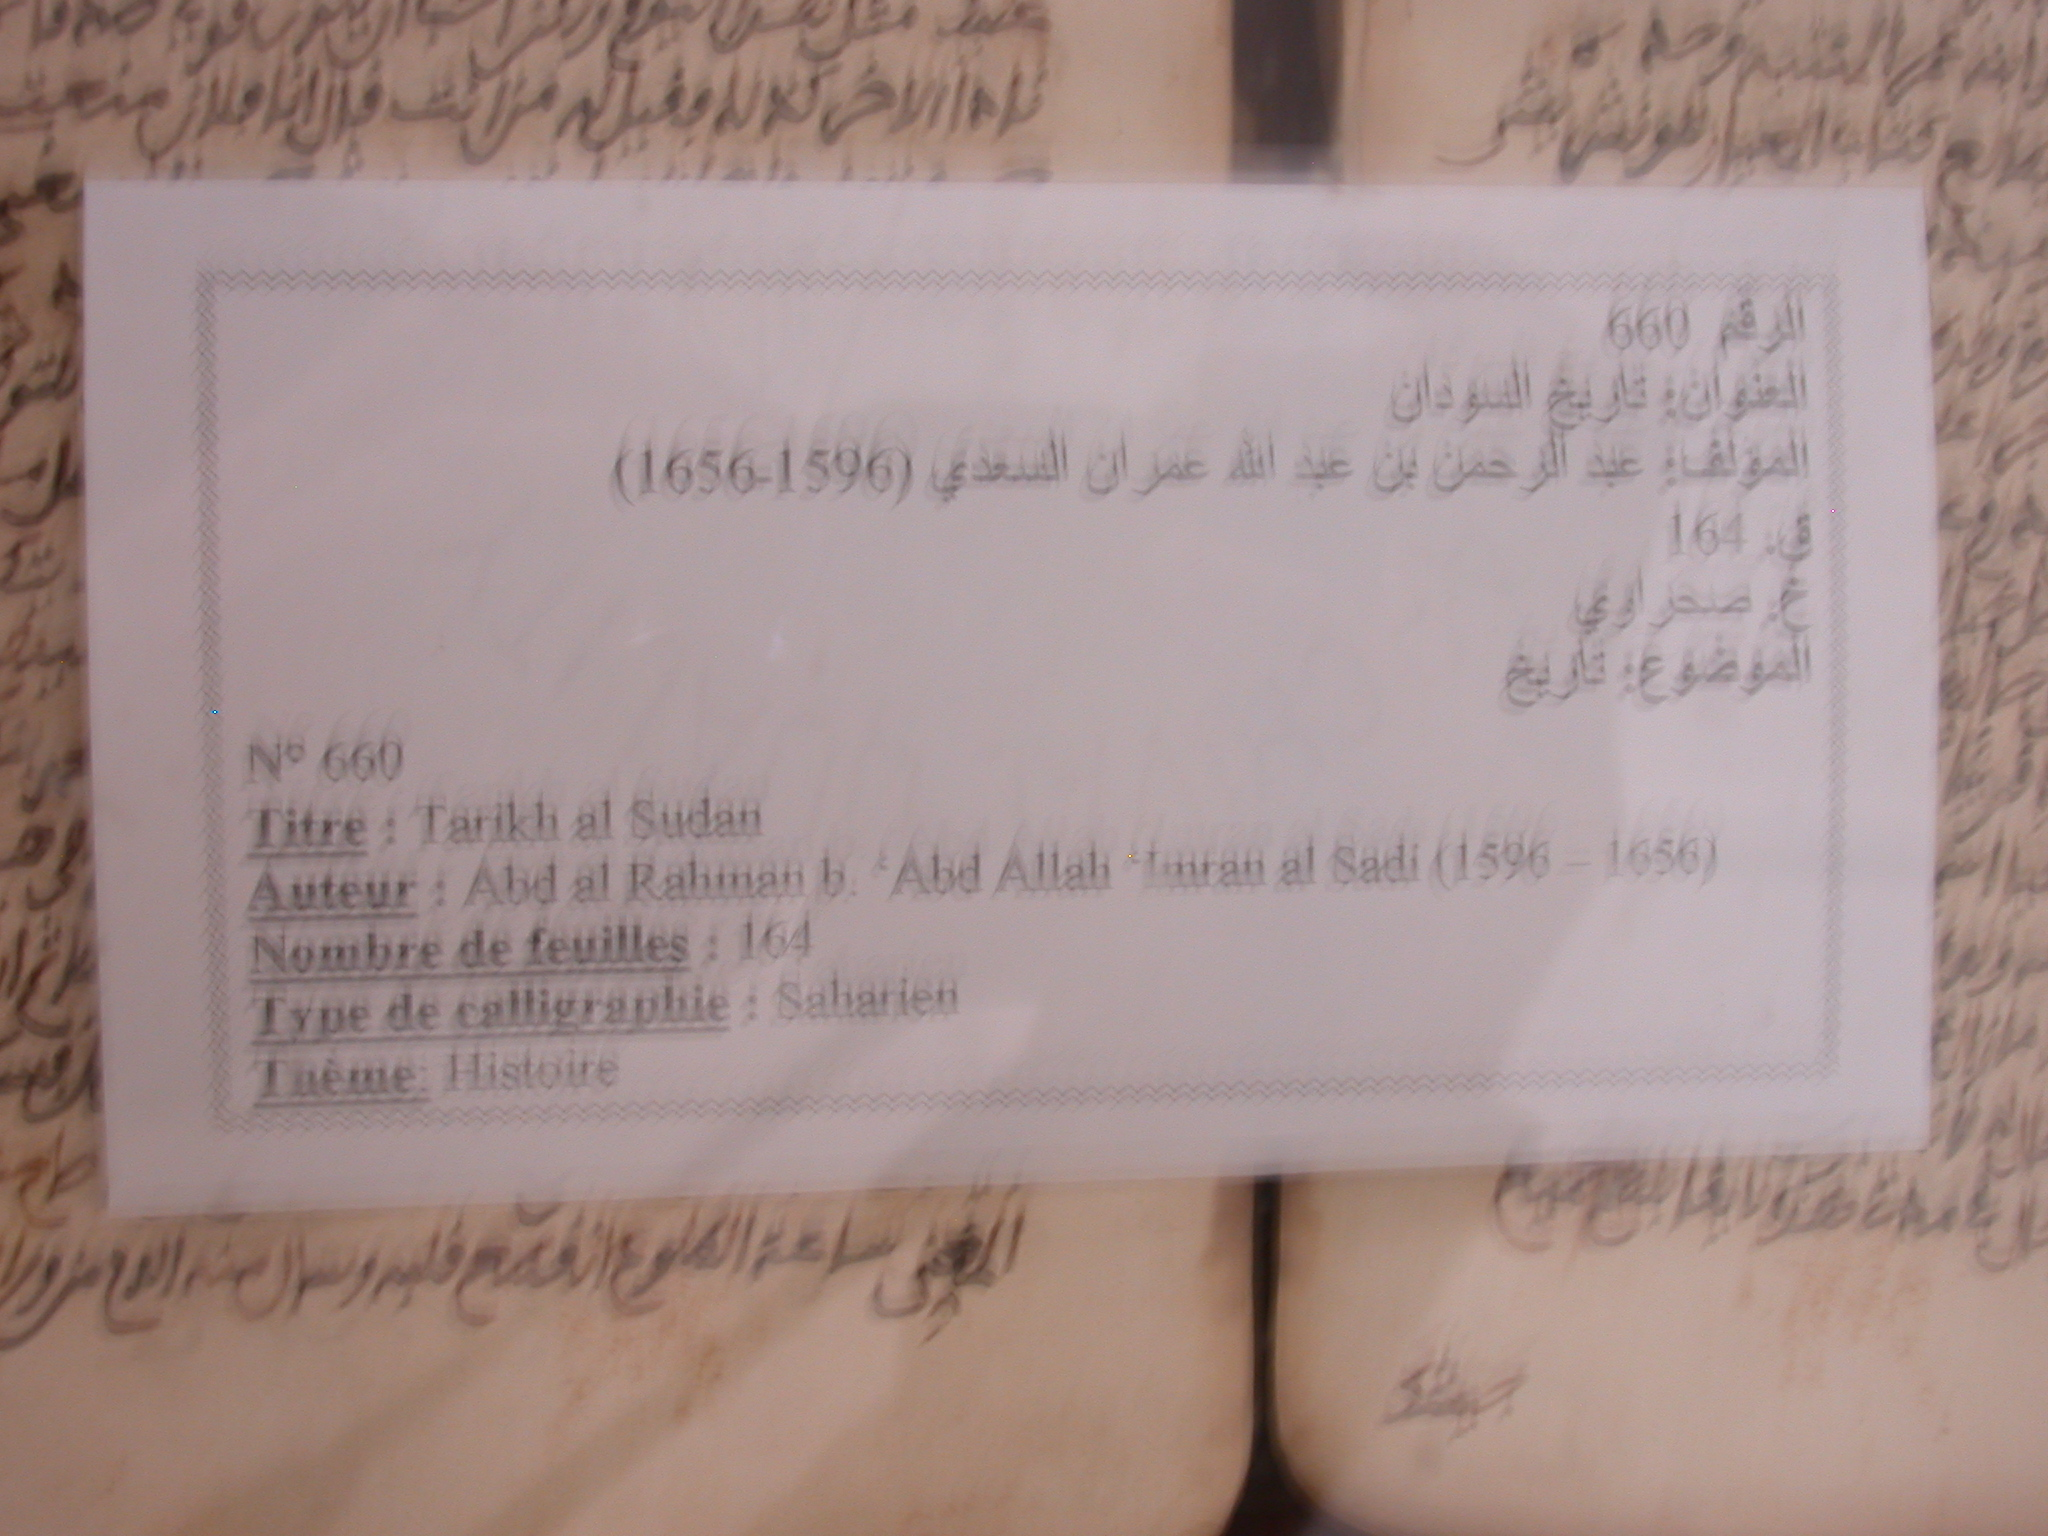 Manuscript, Tarikh al Sudan, Detail, Ahmed Baba Institute, Institut des Hautes Etudes et de Recherches Islamiques, Timbuktu, Mali